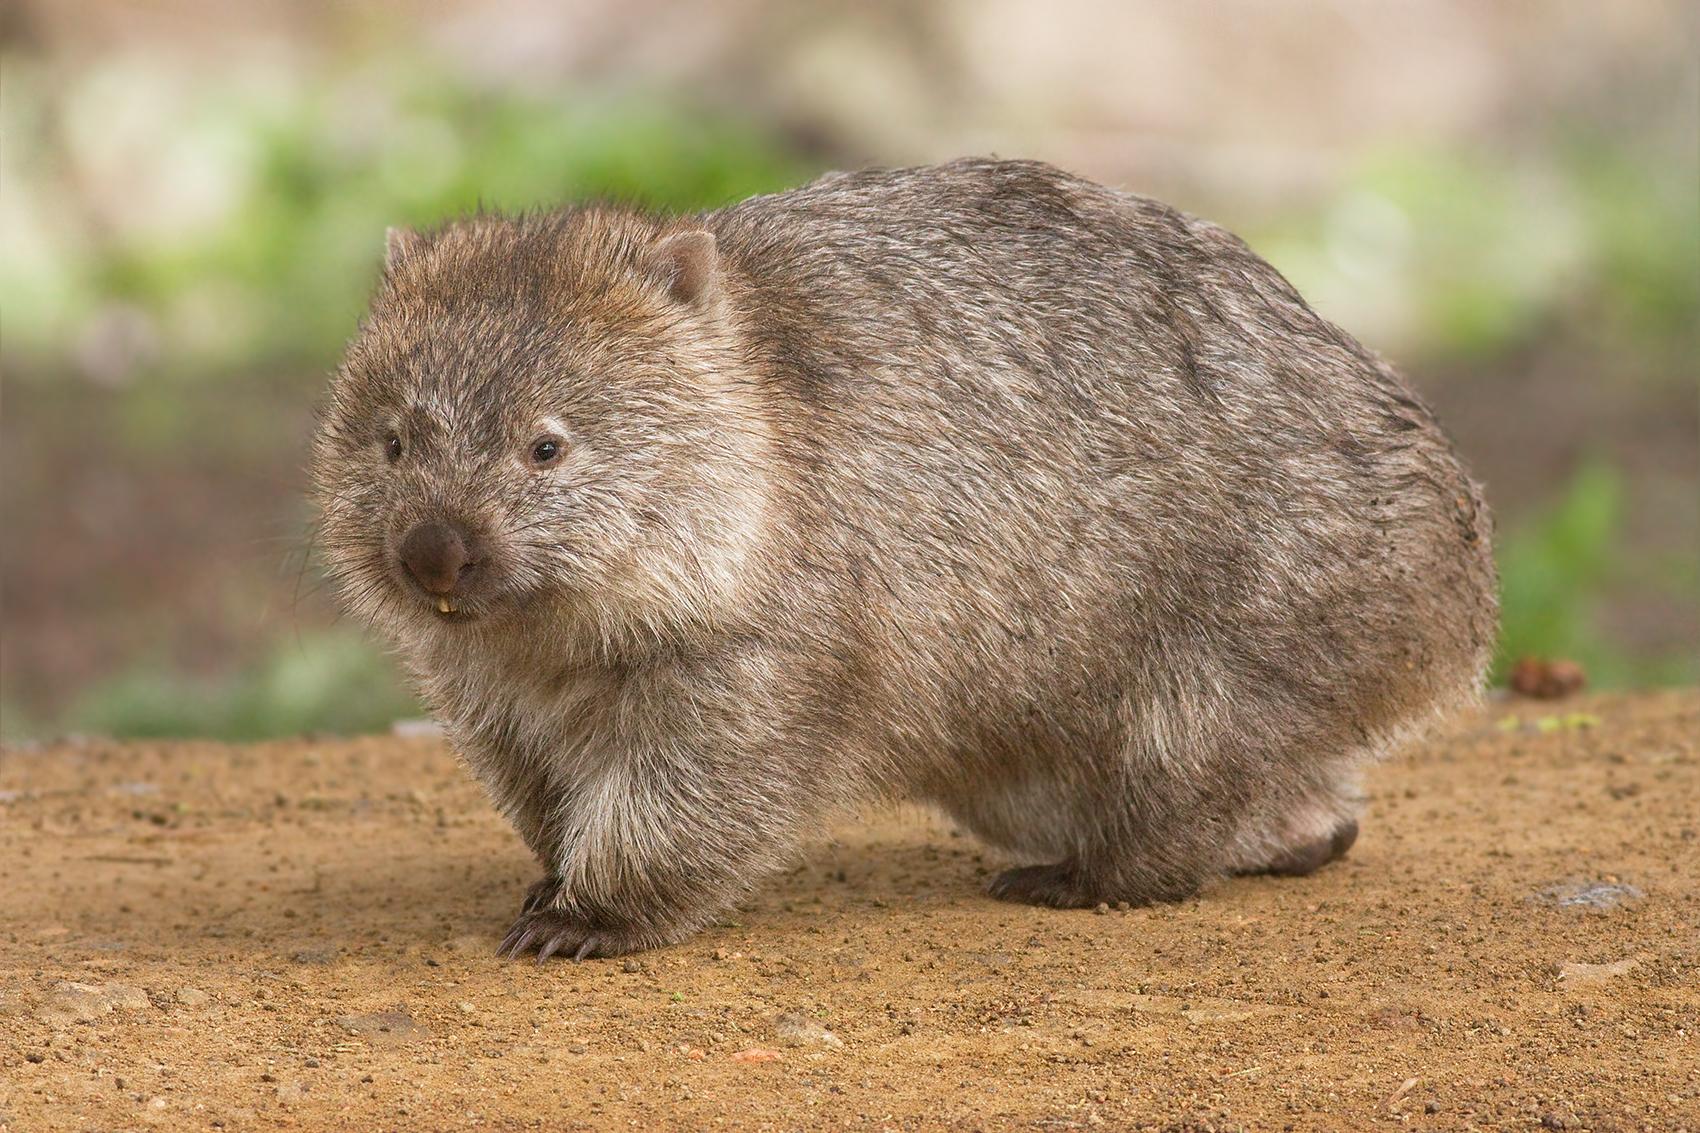 Common Wombat (Vombatus ursinus tasmaniensis) on Maria Island, Tasmania, Australia. By JJ Harrison (http://www.noodlesnacks.com/)